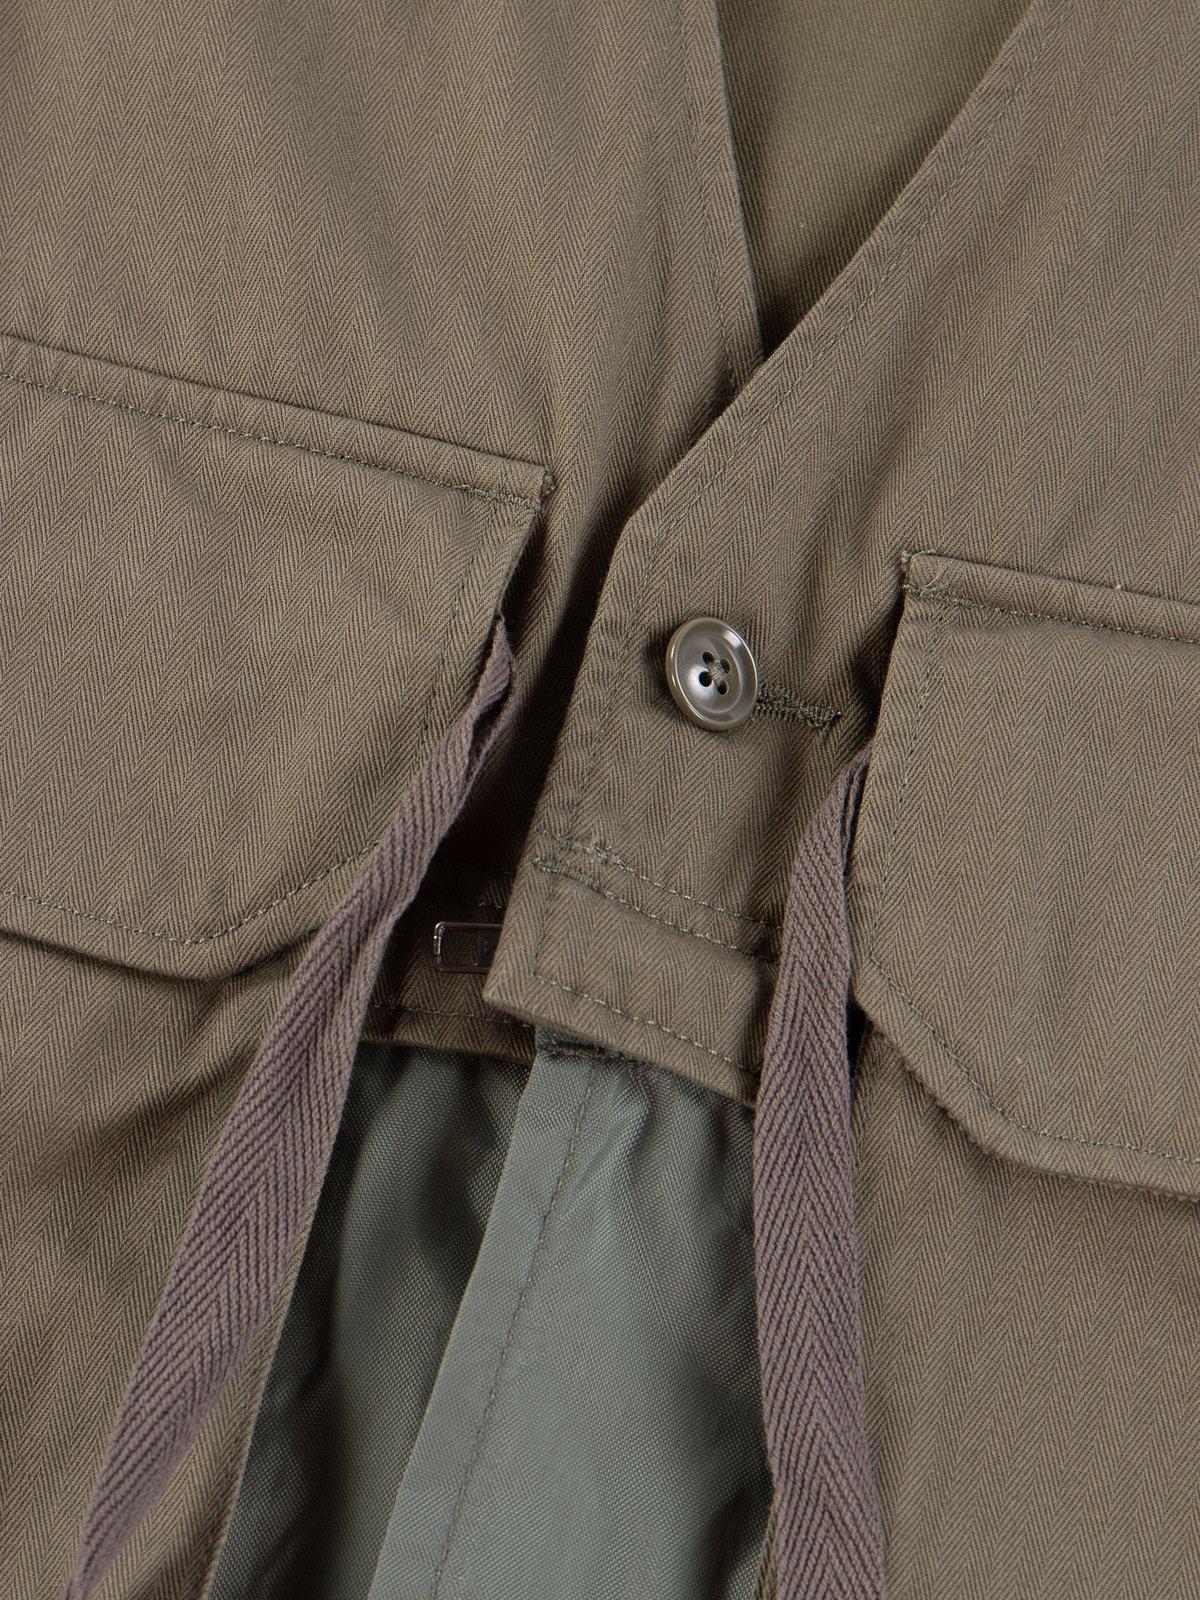 Olive Cotton Herringbone Twill Long Fowl Vest - Image 5